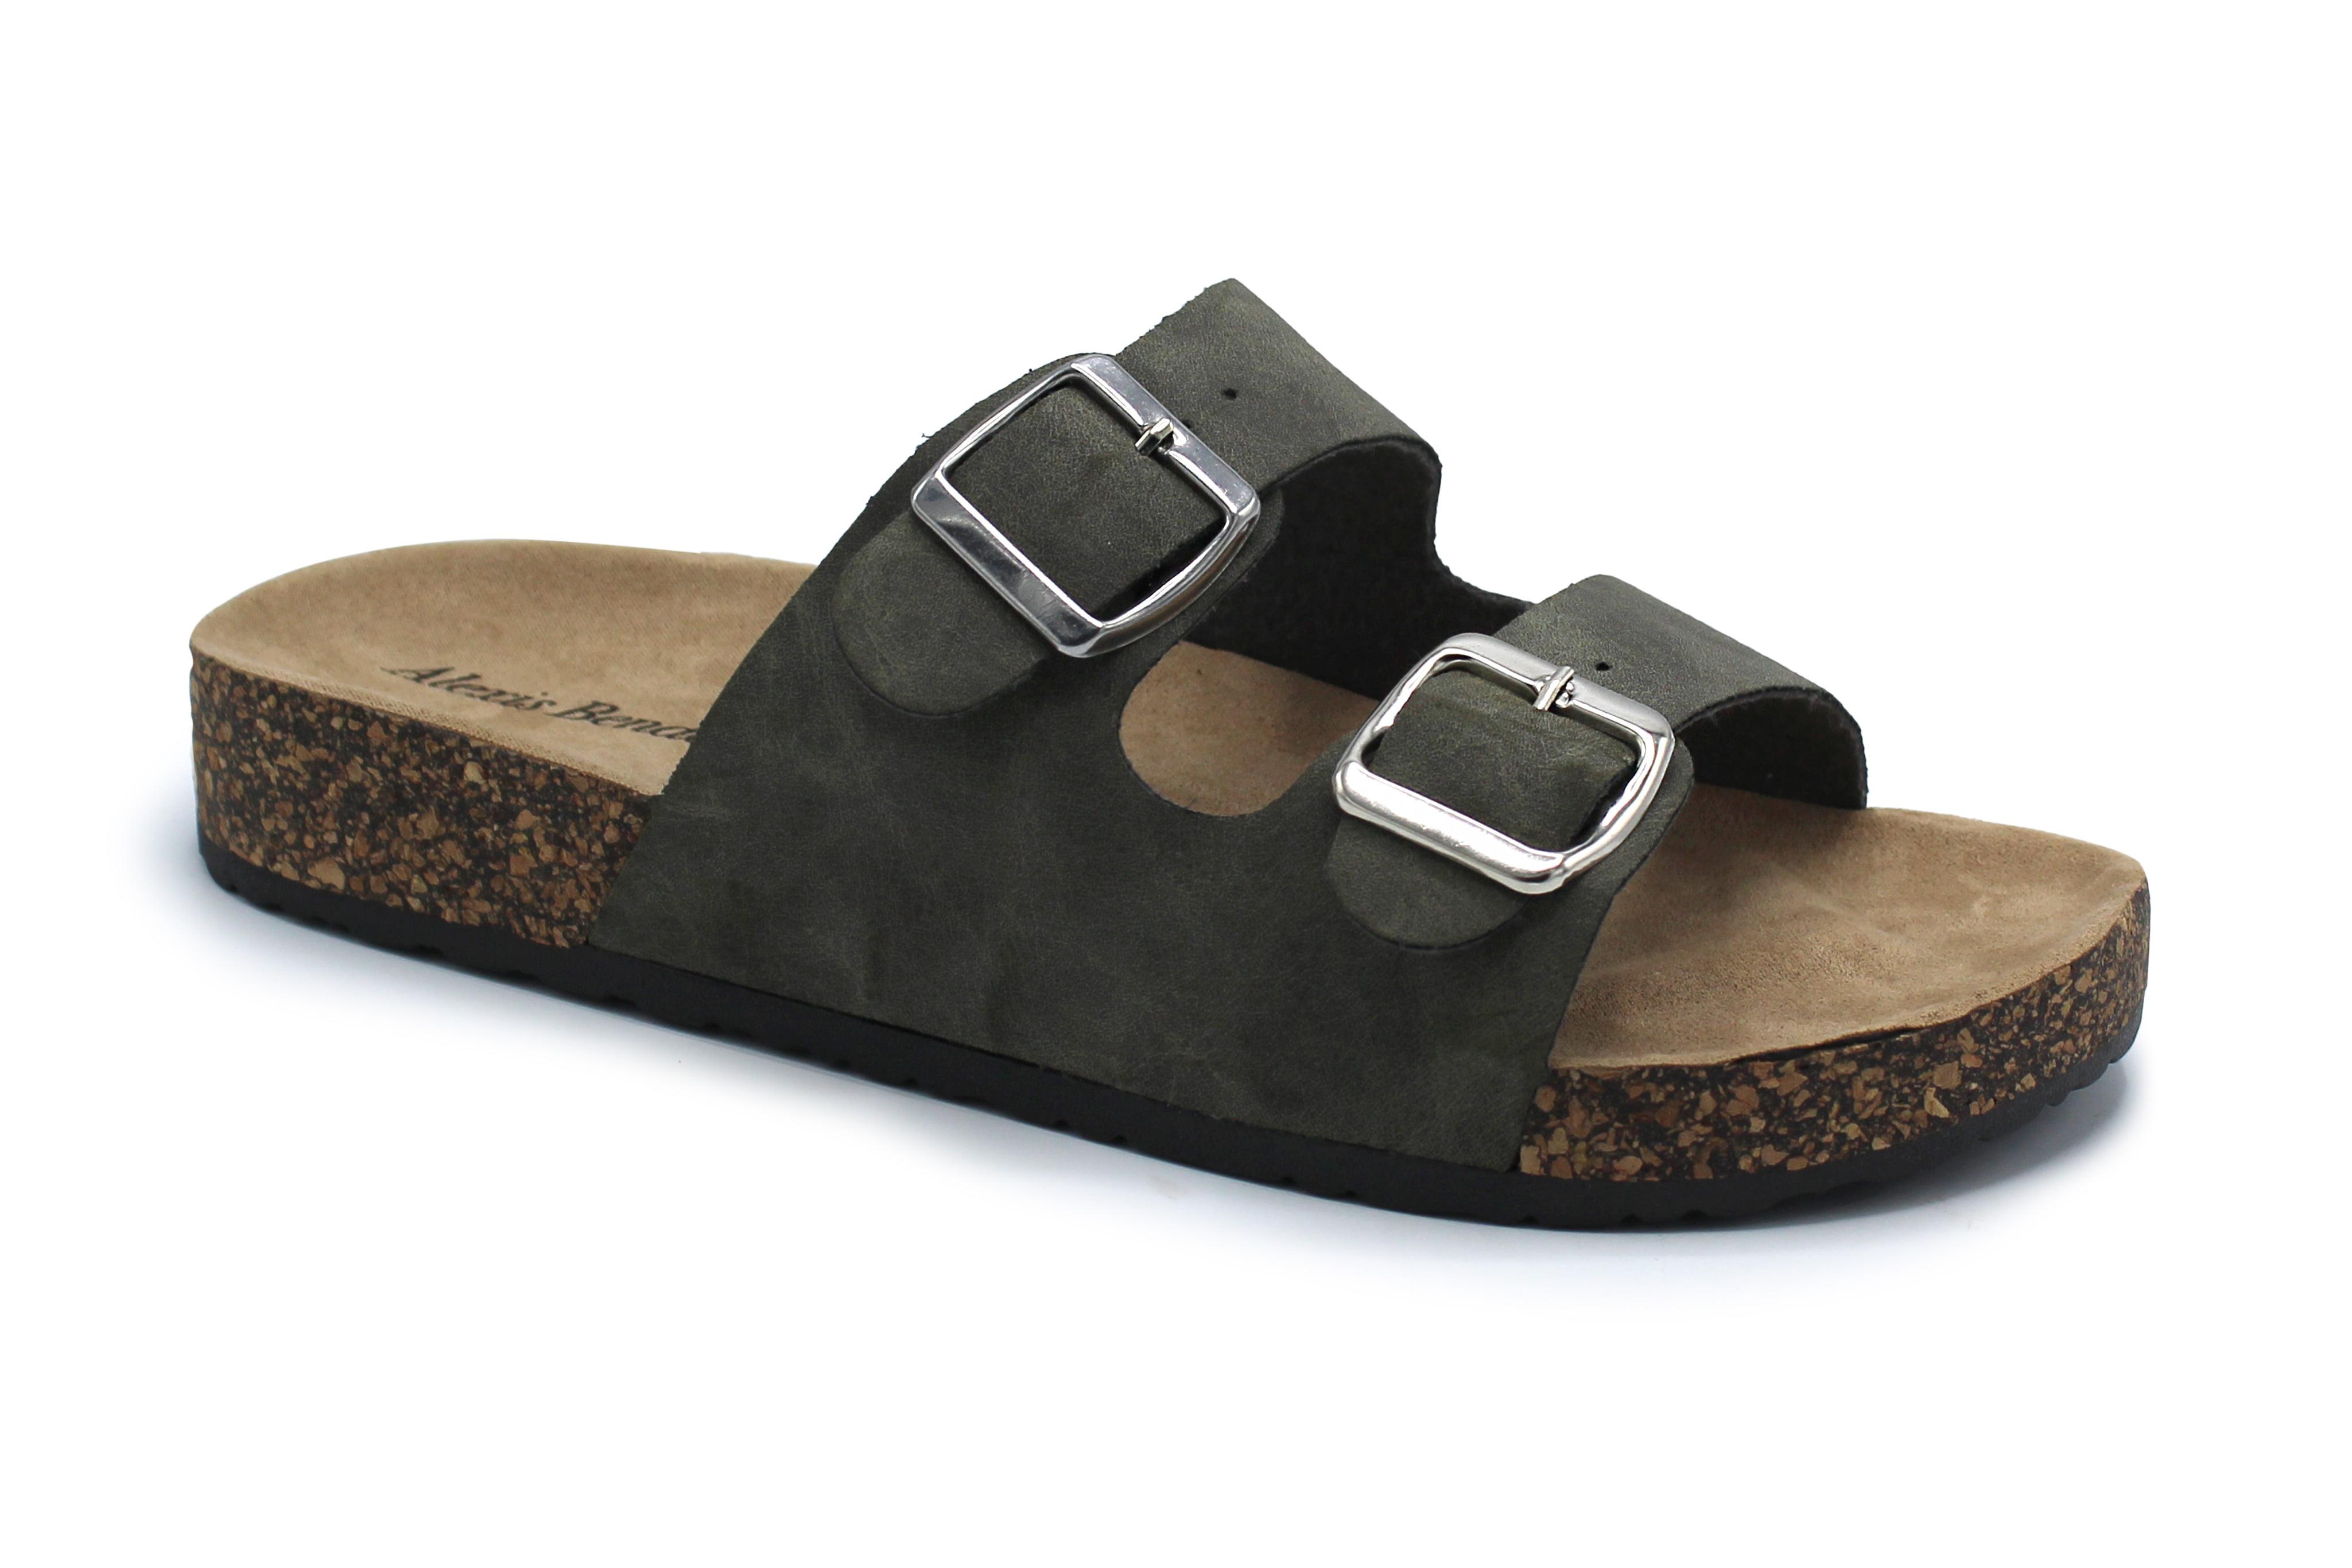 f36374ea09c2 Fashion Brands Group - Kylie-01 Women Double Buckle Straps Sandals Flip  Flop Platform Footbed Sandals Olive 7 - Walmart.com